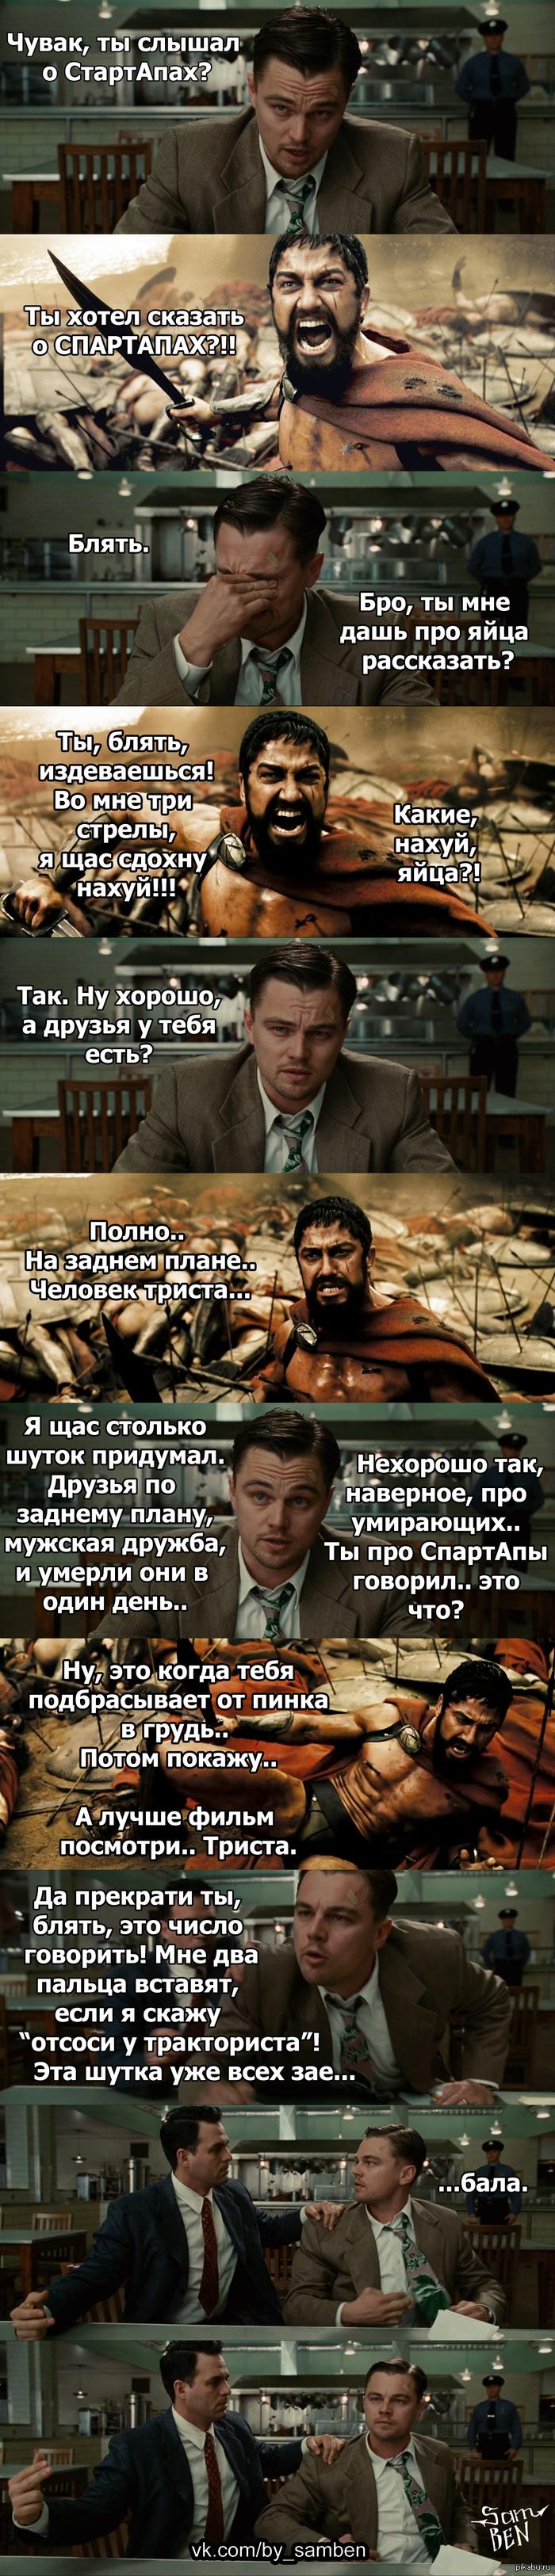 "Стартап как продолжение этого поста <a href=""http://pikabu.ru/story/bulon_1778704"">http://pikabu.ru/story/_1778704</a>"